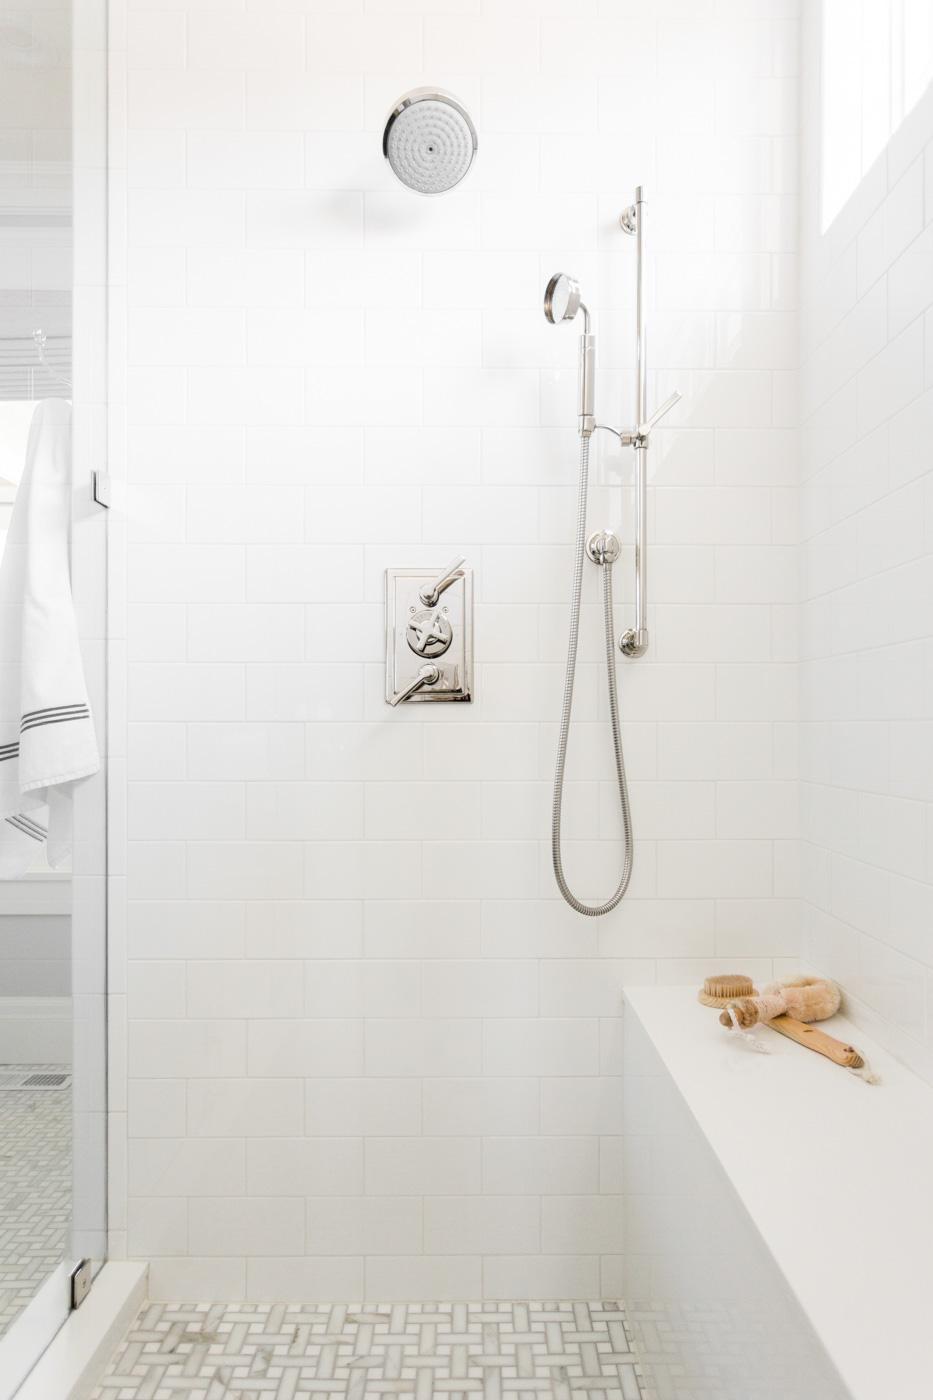 Silver faucet details on bathroom shower